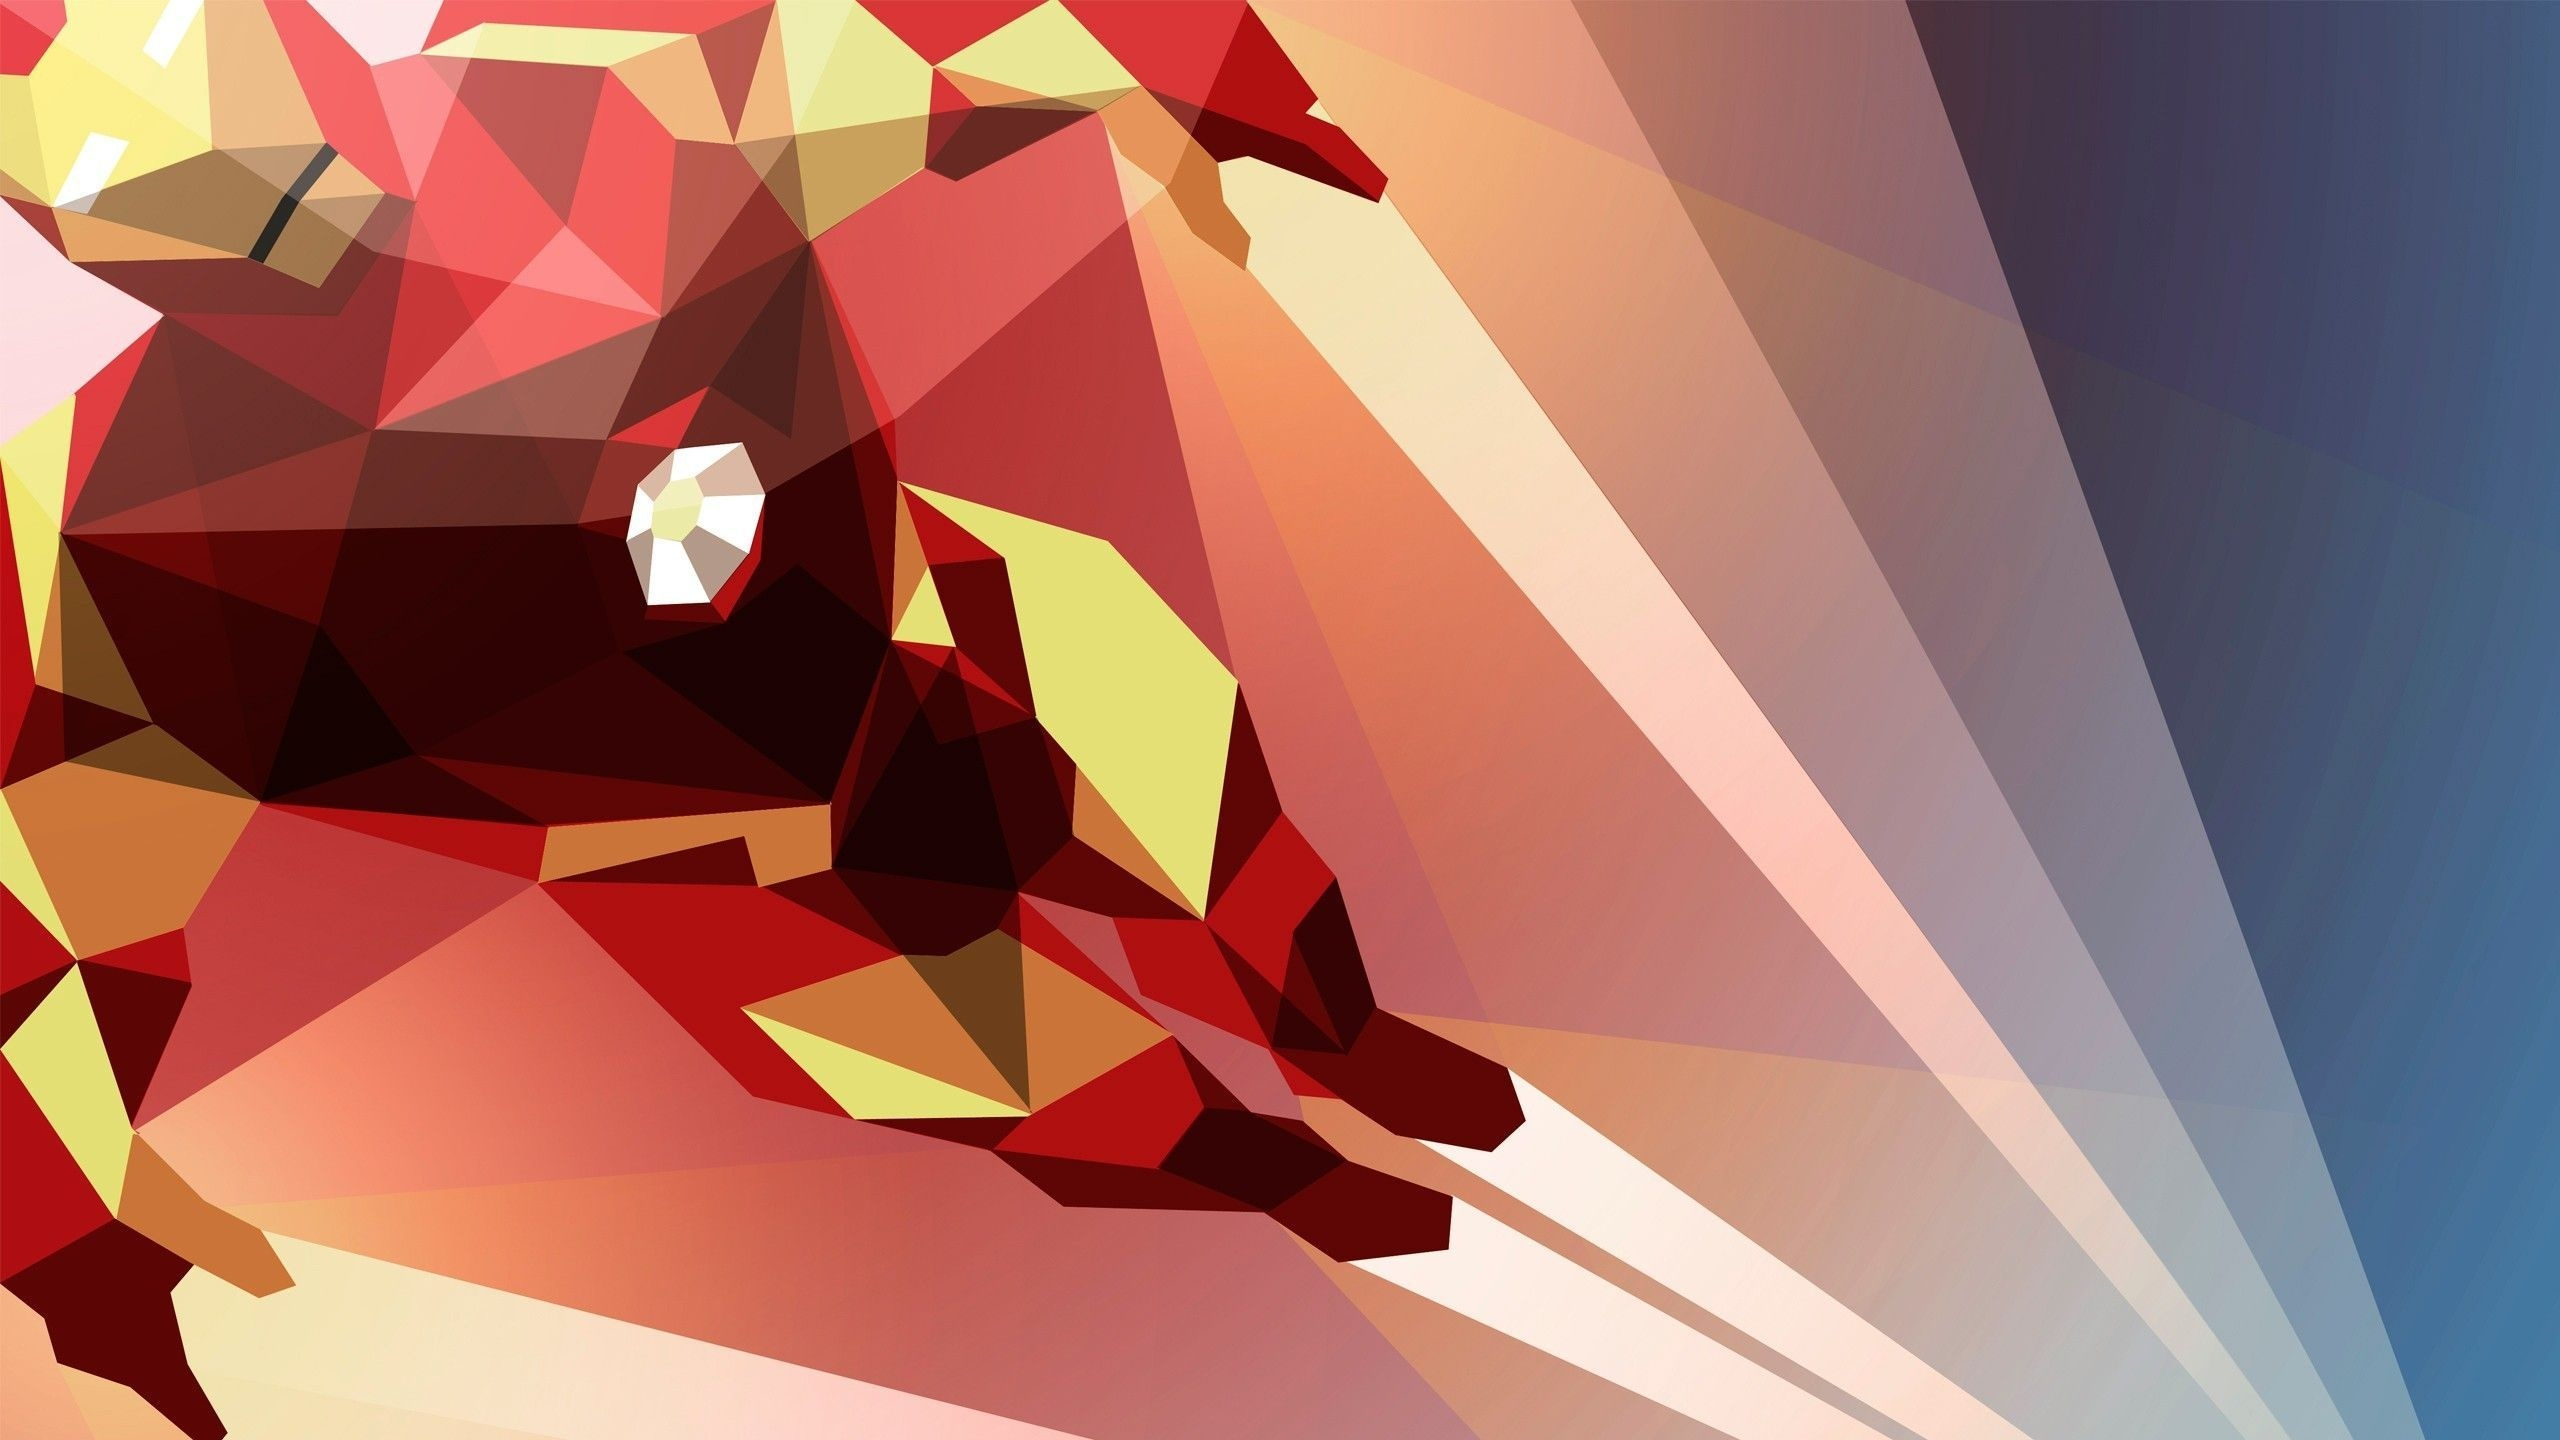 Superhero Design Backgrounds